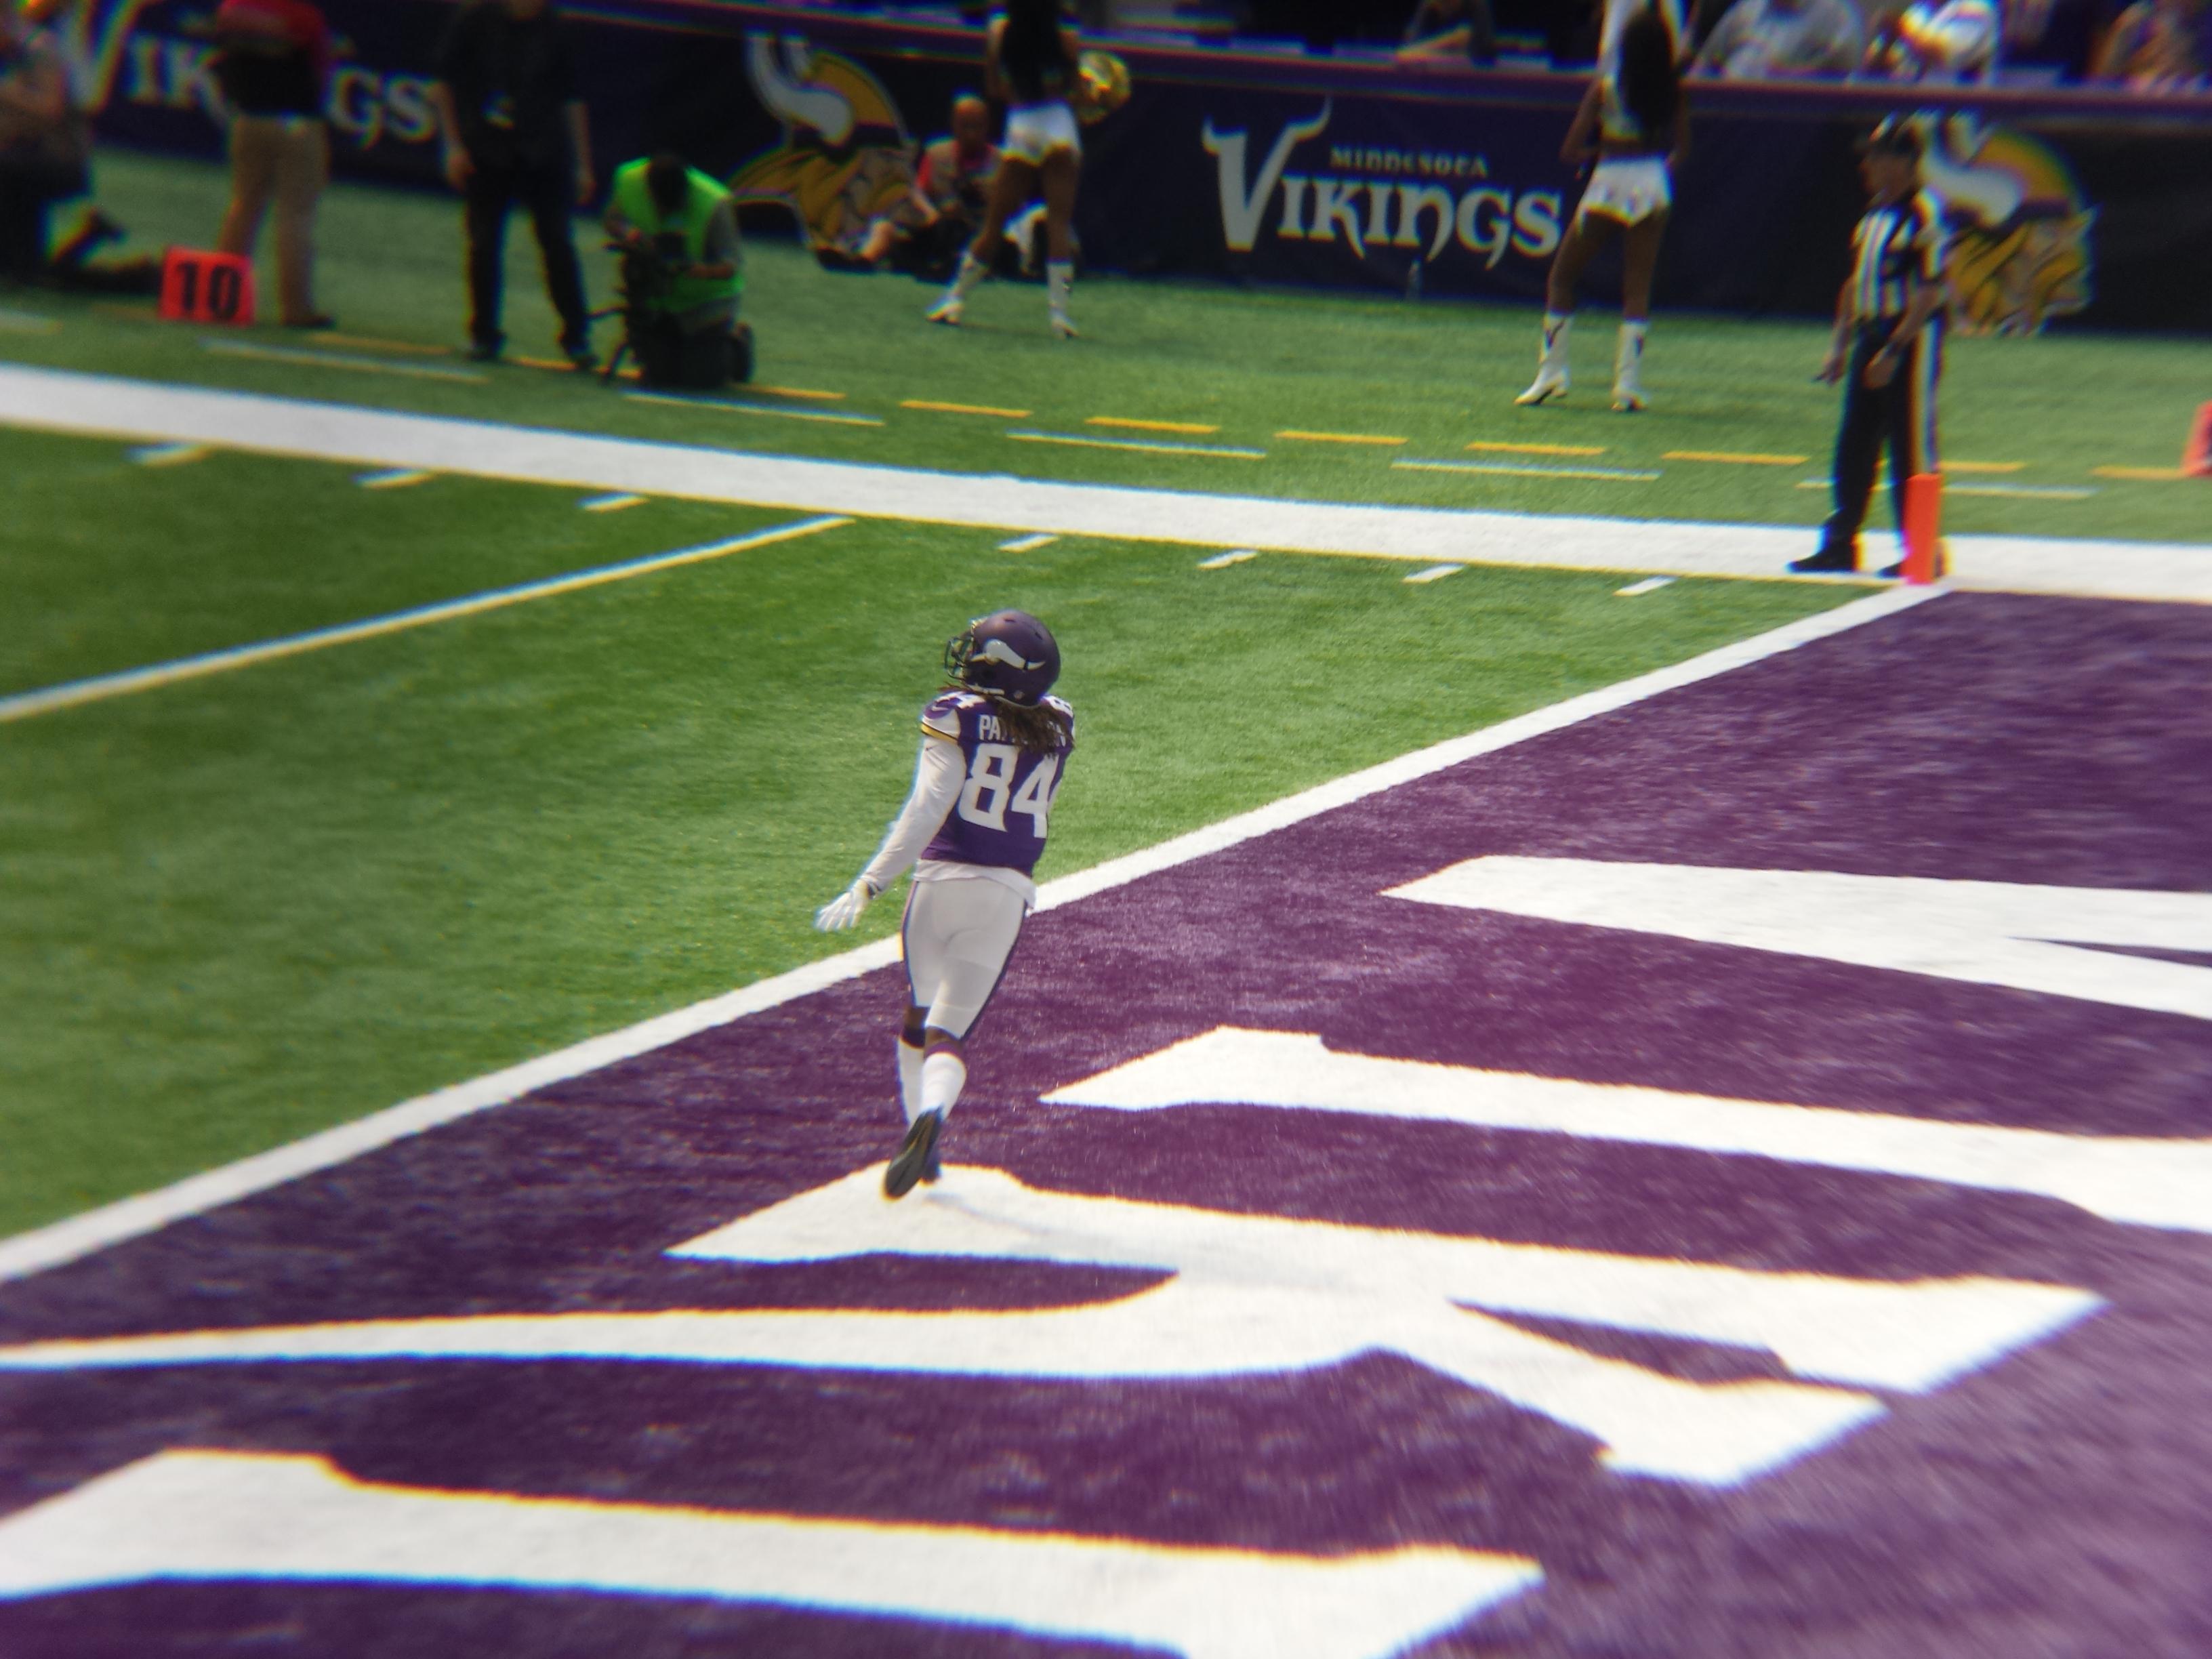 Minnesota Vikings U.S. Bank Stadium First Game - Cordarrelle Patterson